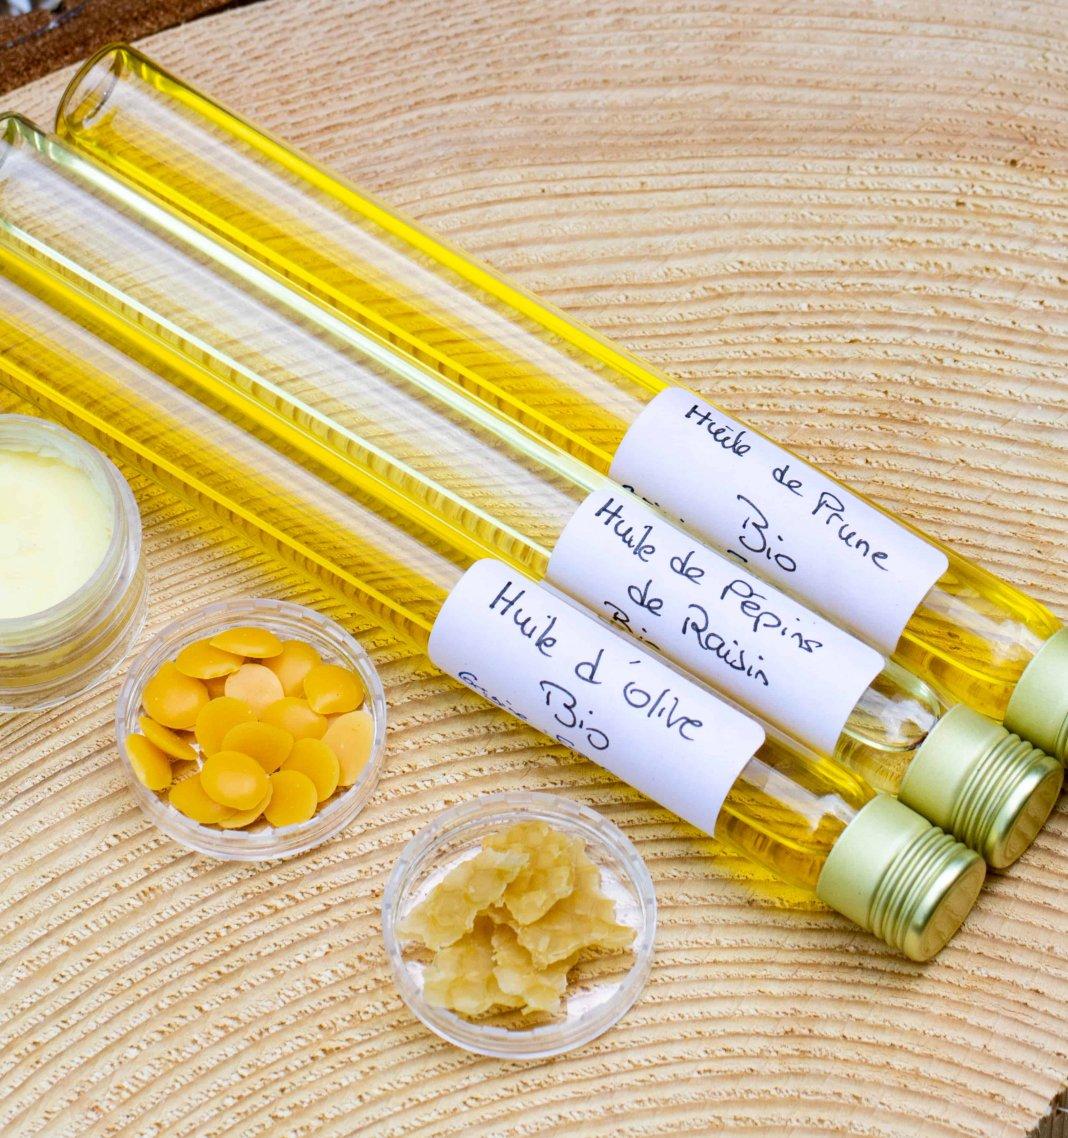 Loesia - Vetegable oil + waxes + butter